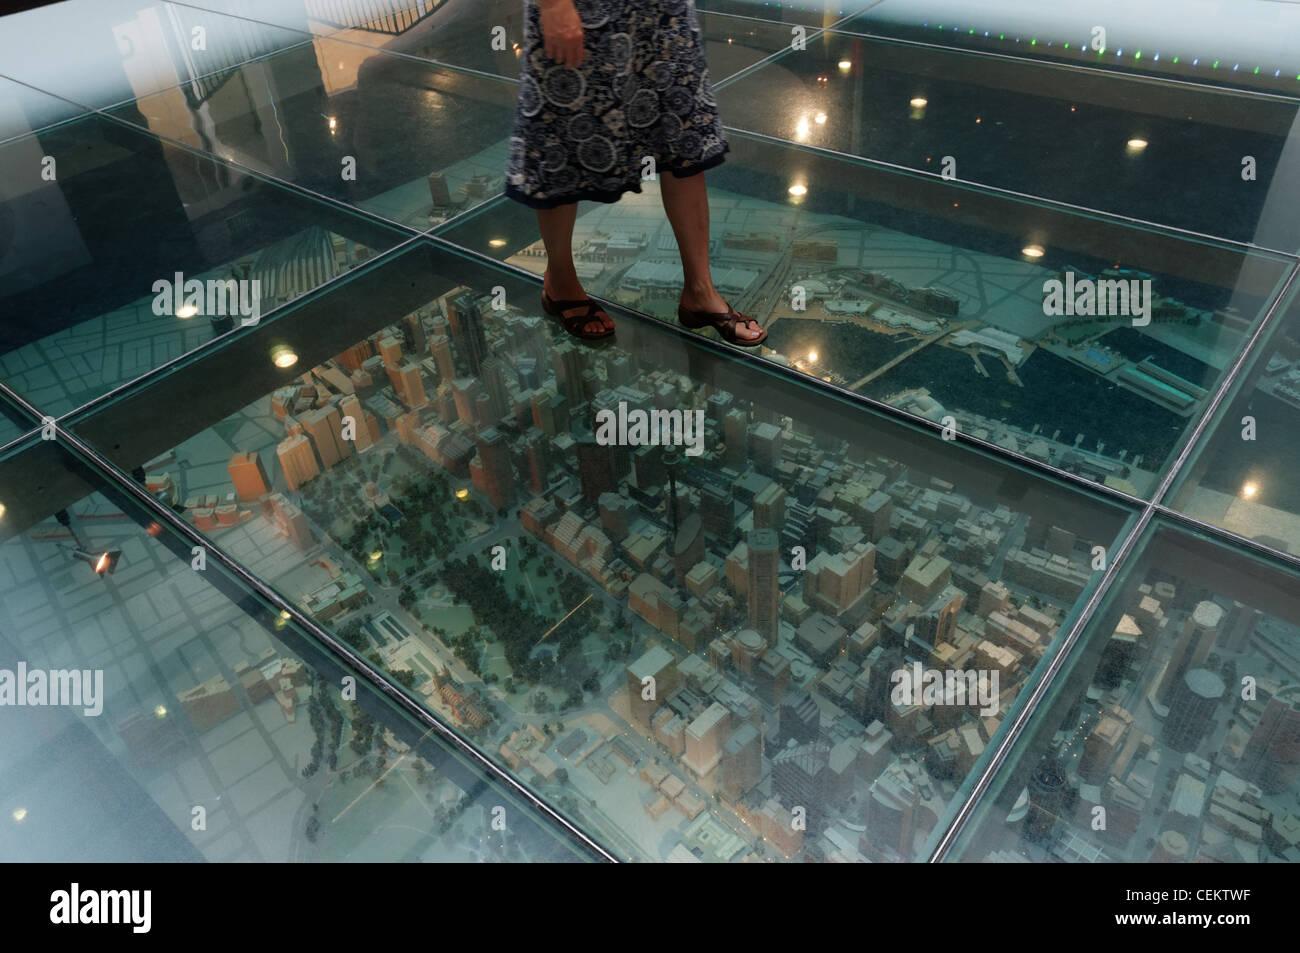 The 1500 Scale Model Of Sydney Under Glass Floor Customs House Australia